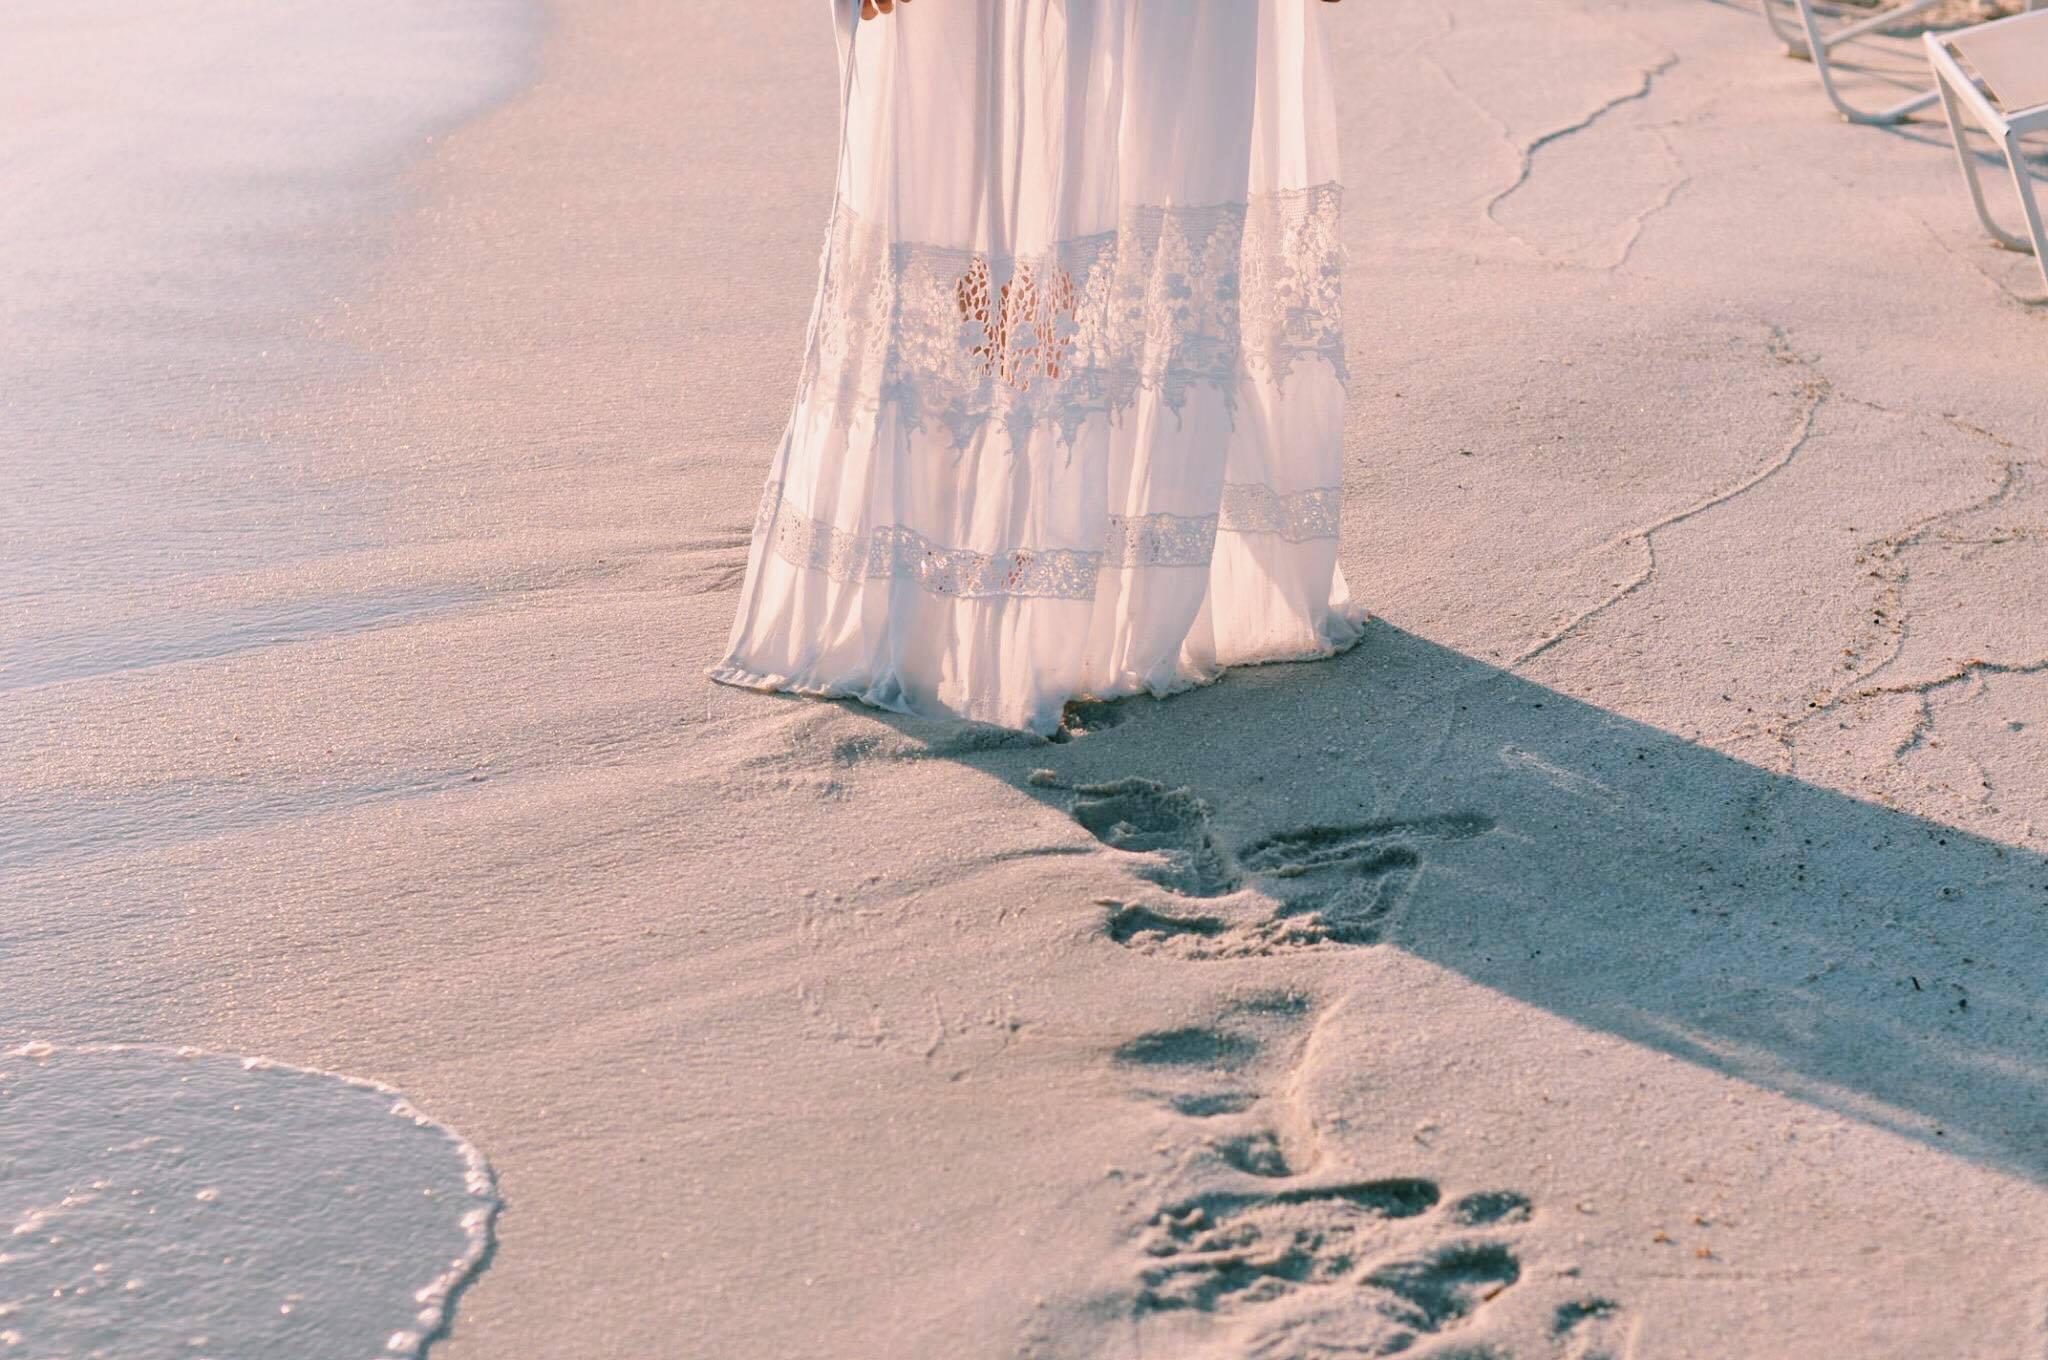 burcu_ozcan_chihuahua_mira_palmarina_palmalife_bodrum_yalikavak_palmalife_beach_burcuozcan_10